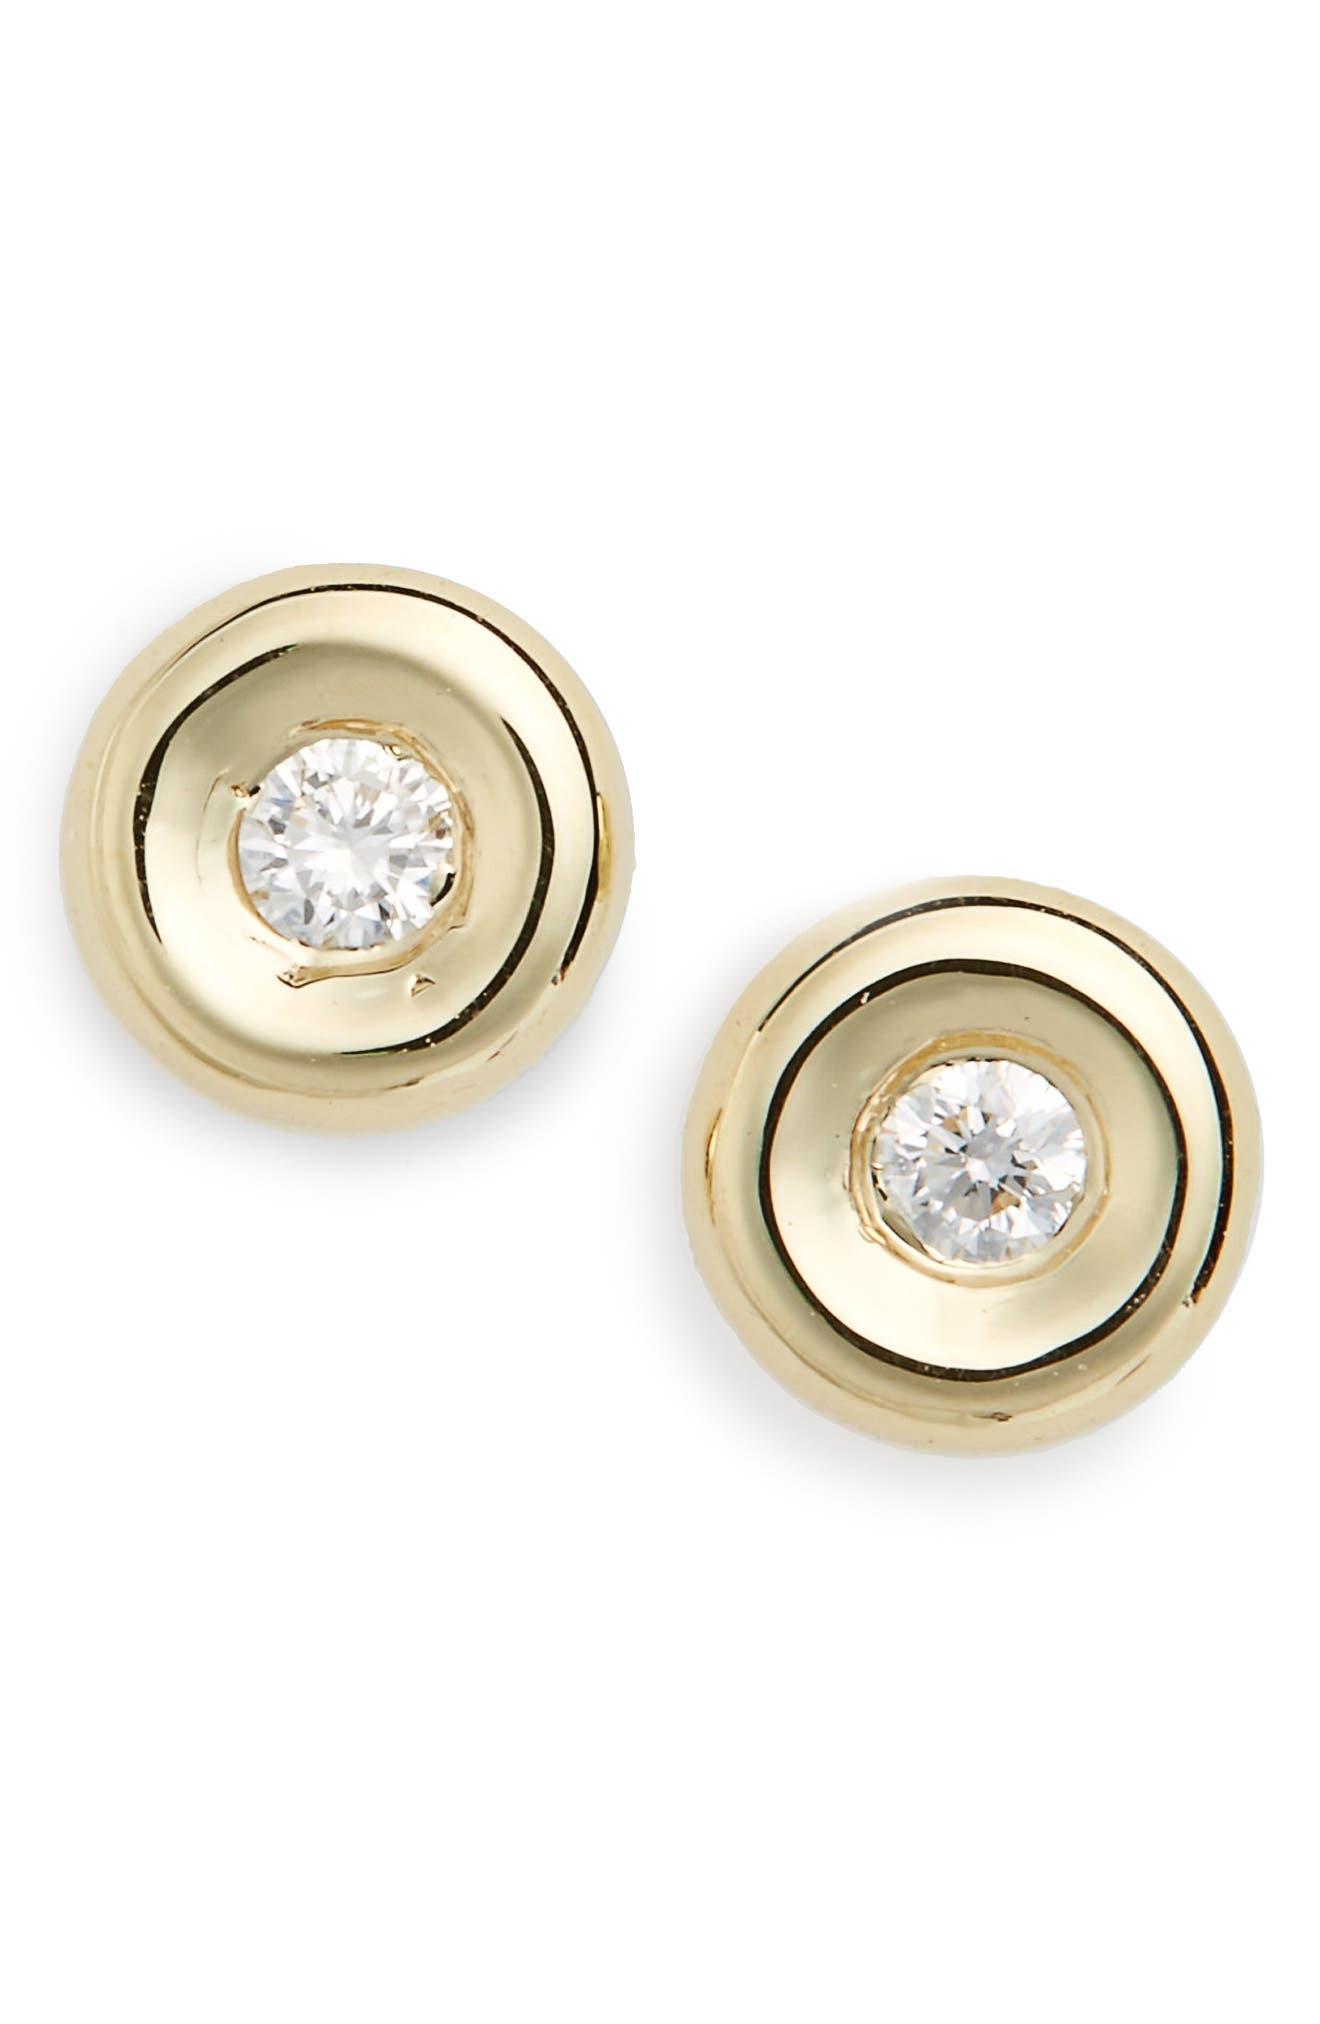 Tiny Treasures Diamond Stud Earrings,                             Main thumbnail 1, color,                             710